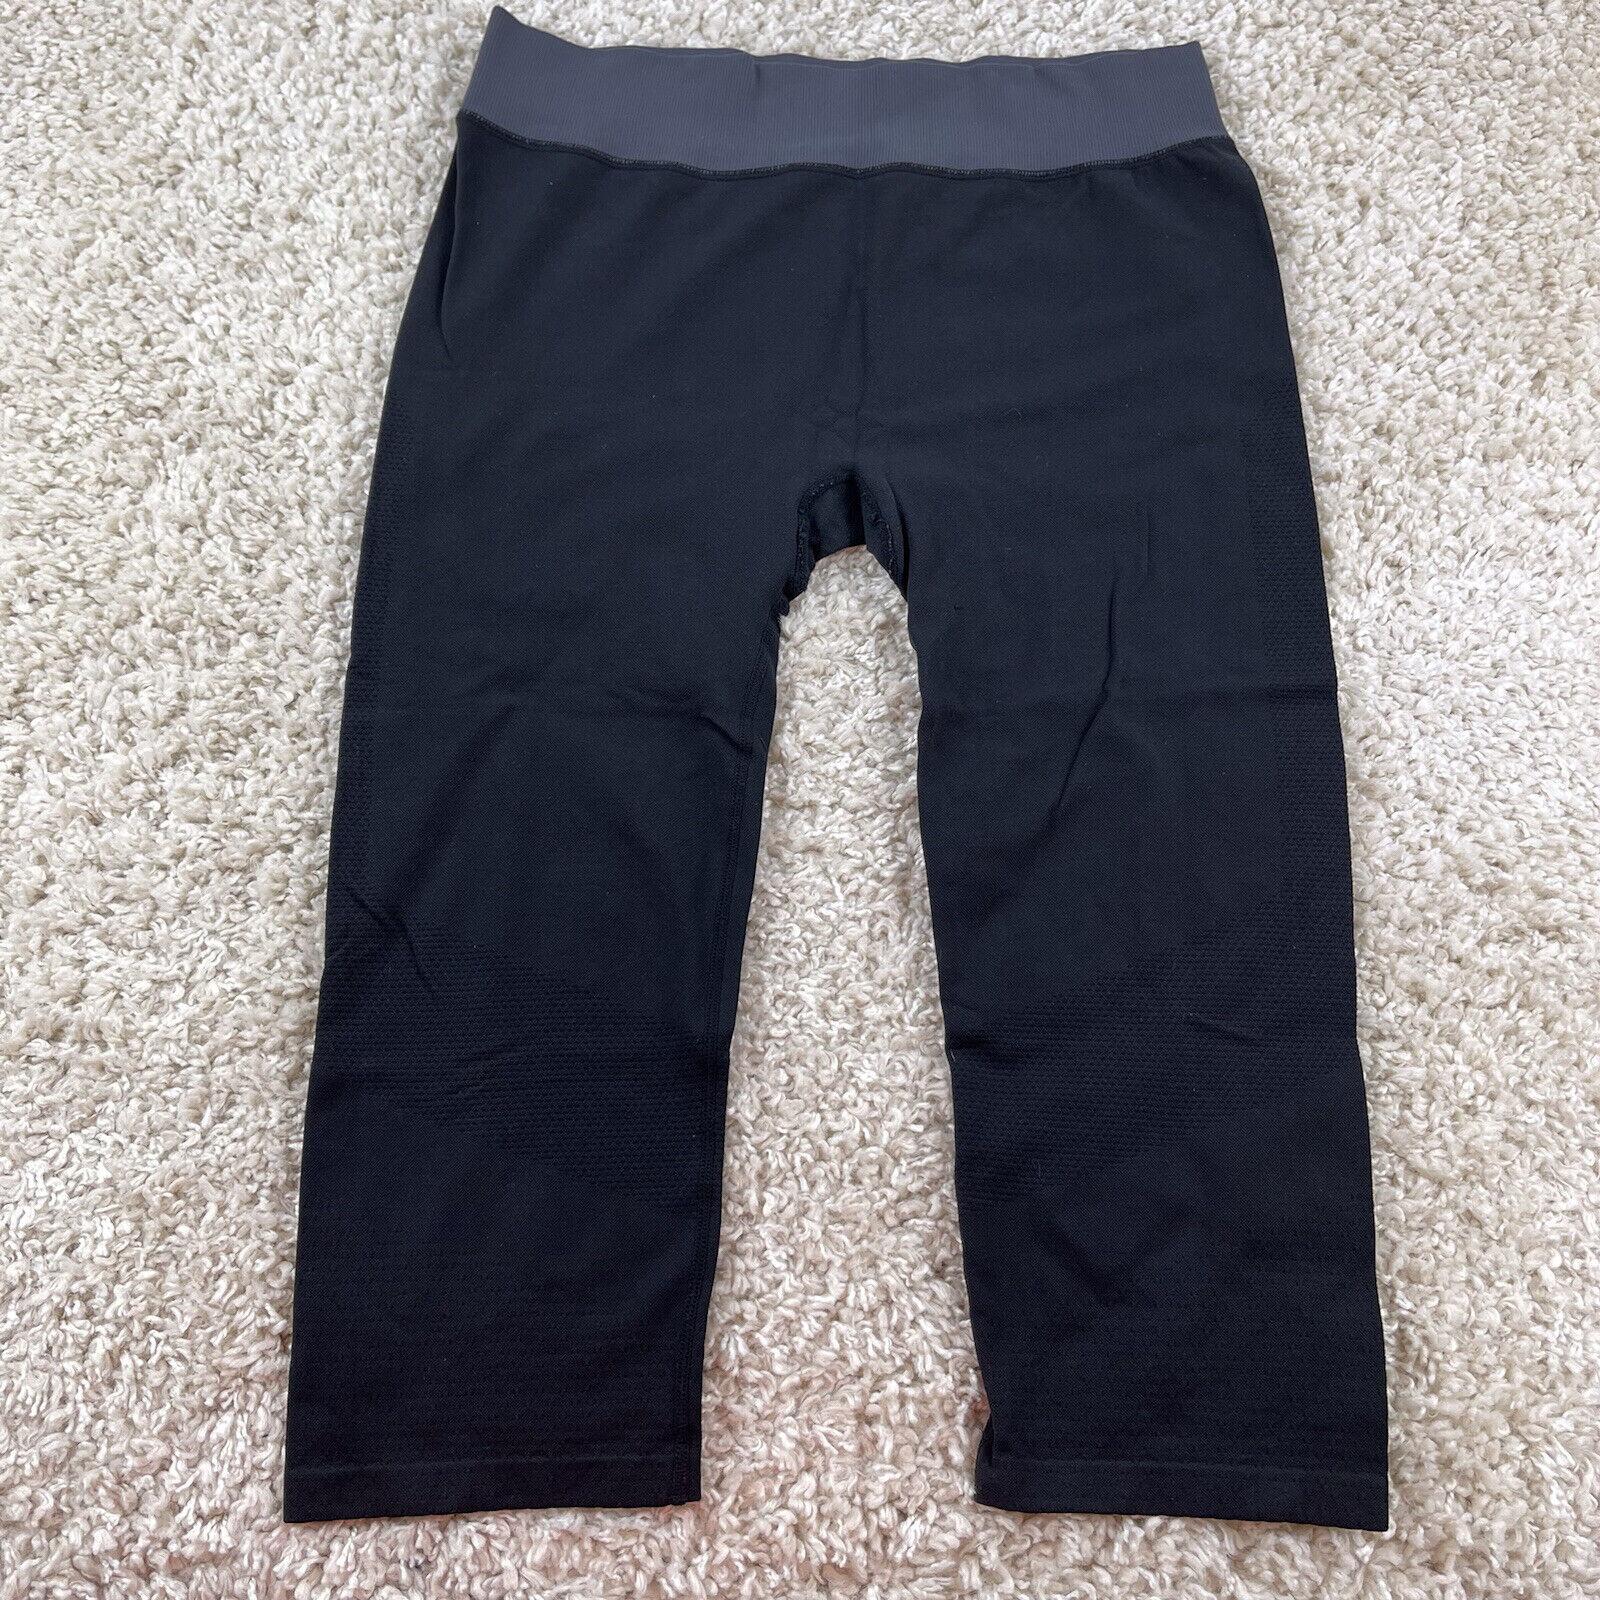 c9 champion duo dry womens large solid black cropped capri leggings athletic